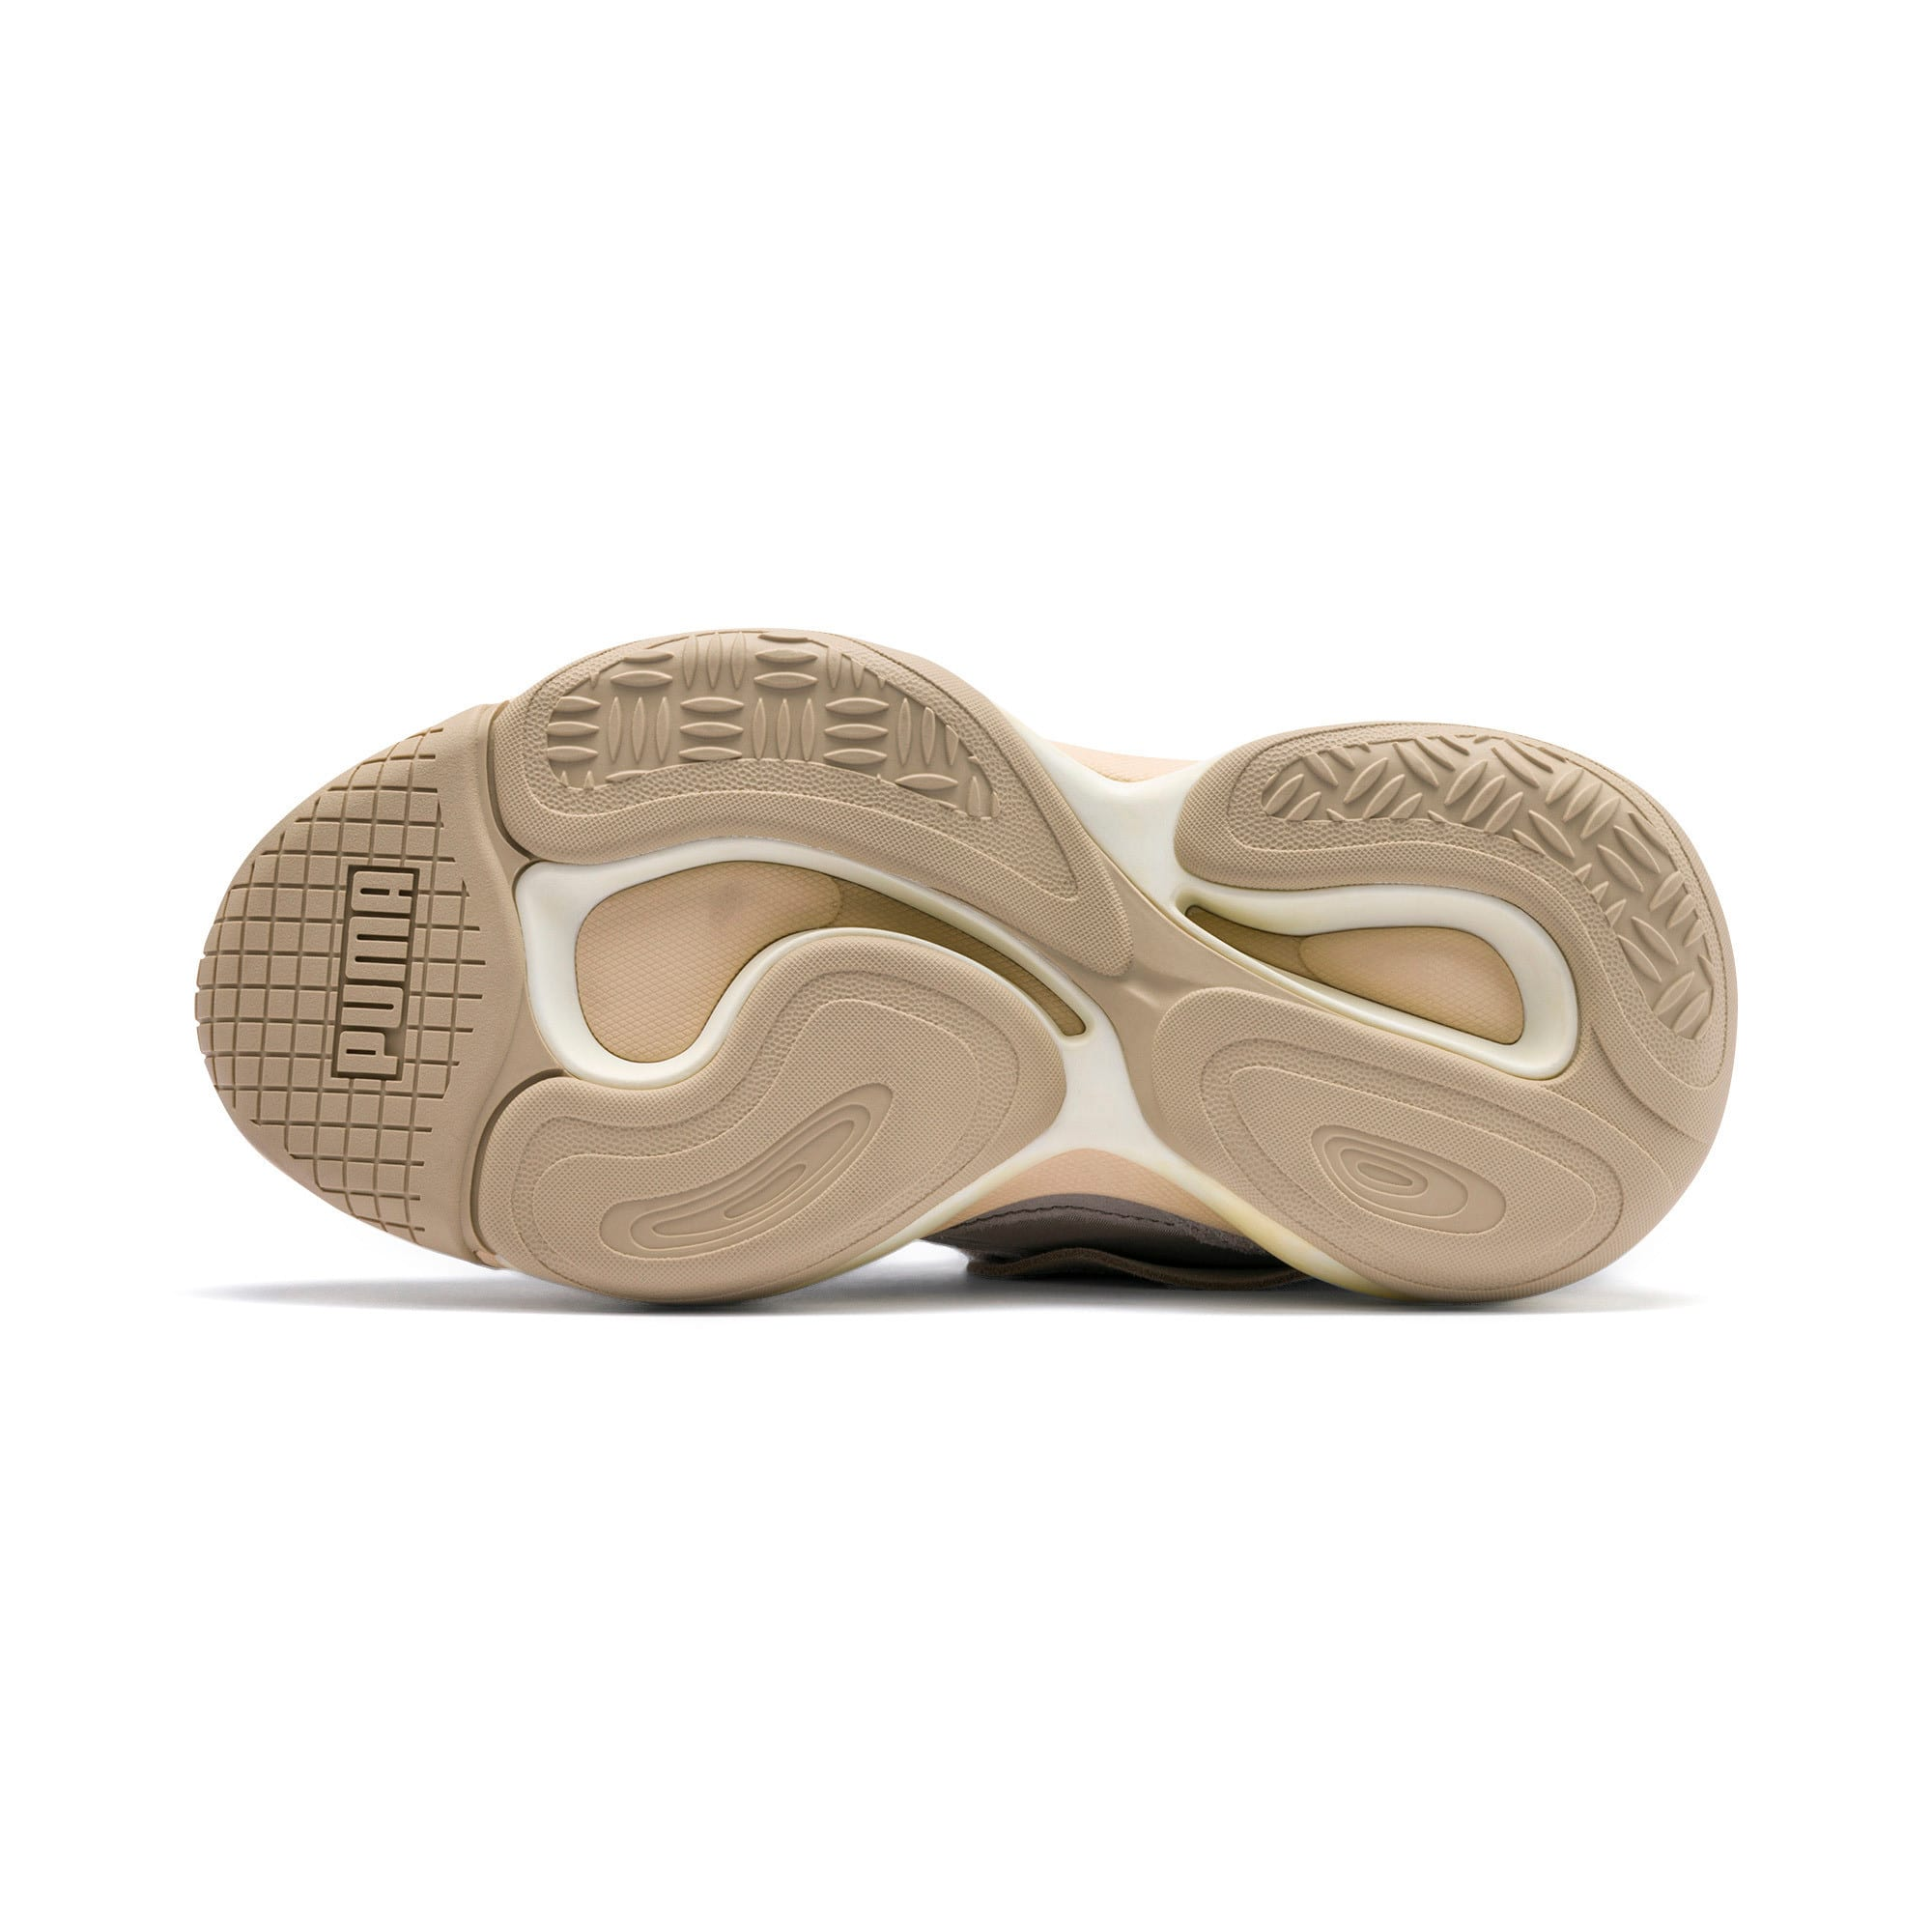 Thumbnail 4 of PUMA x RHUDE Alteration Sneakers, Chinchilla-Whisper White, medium